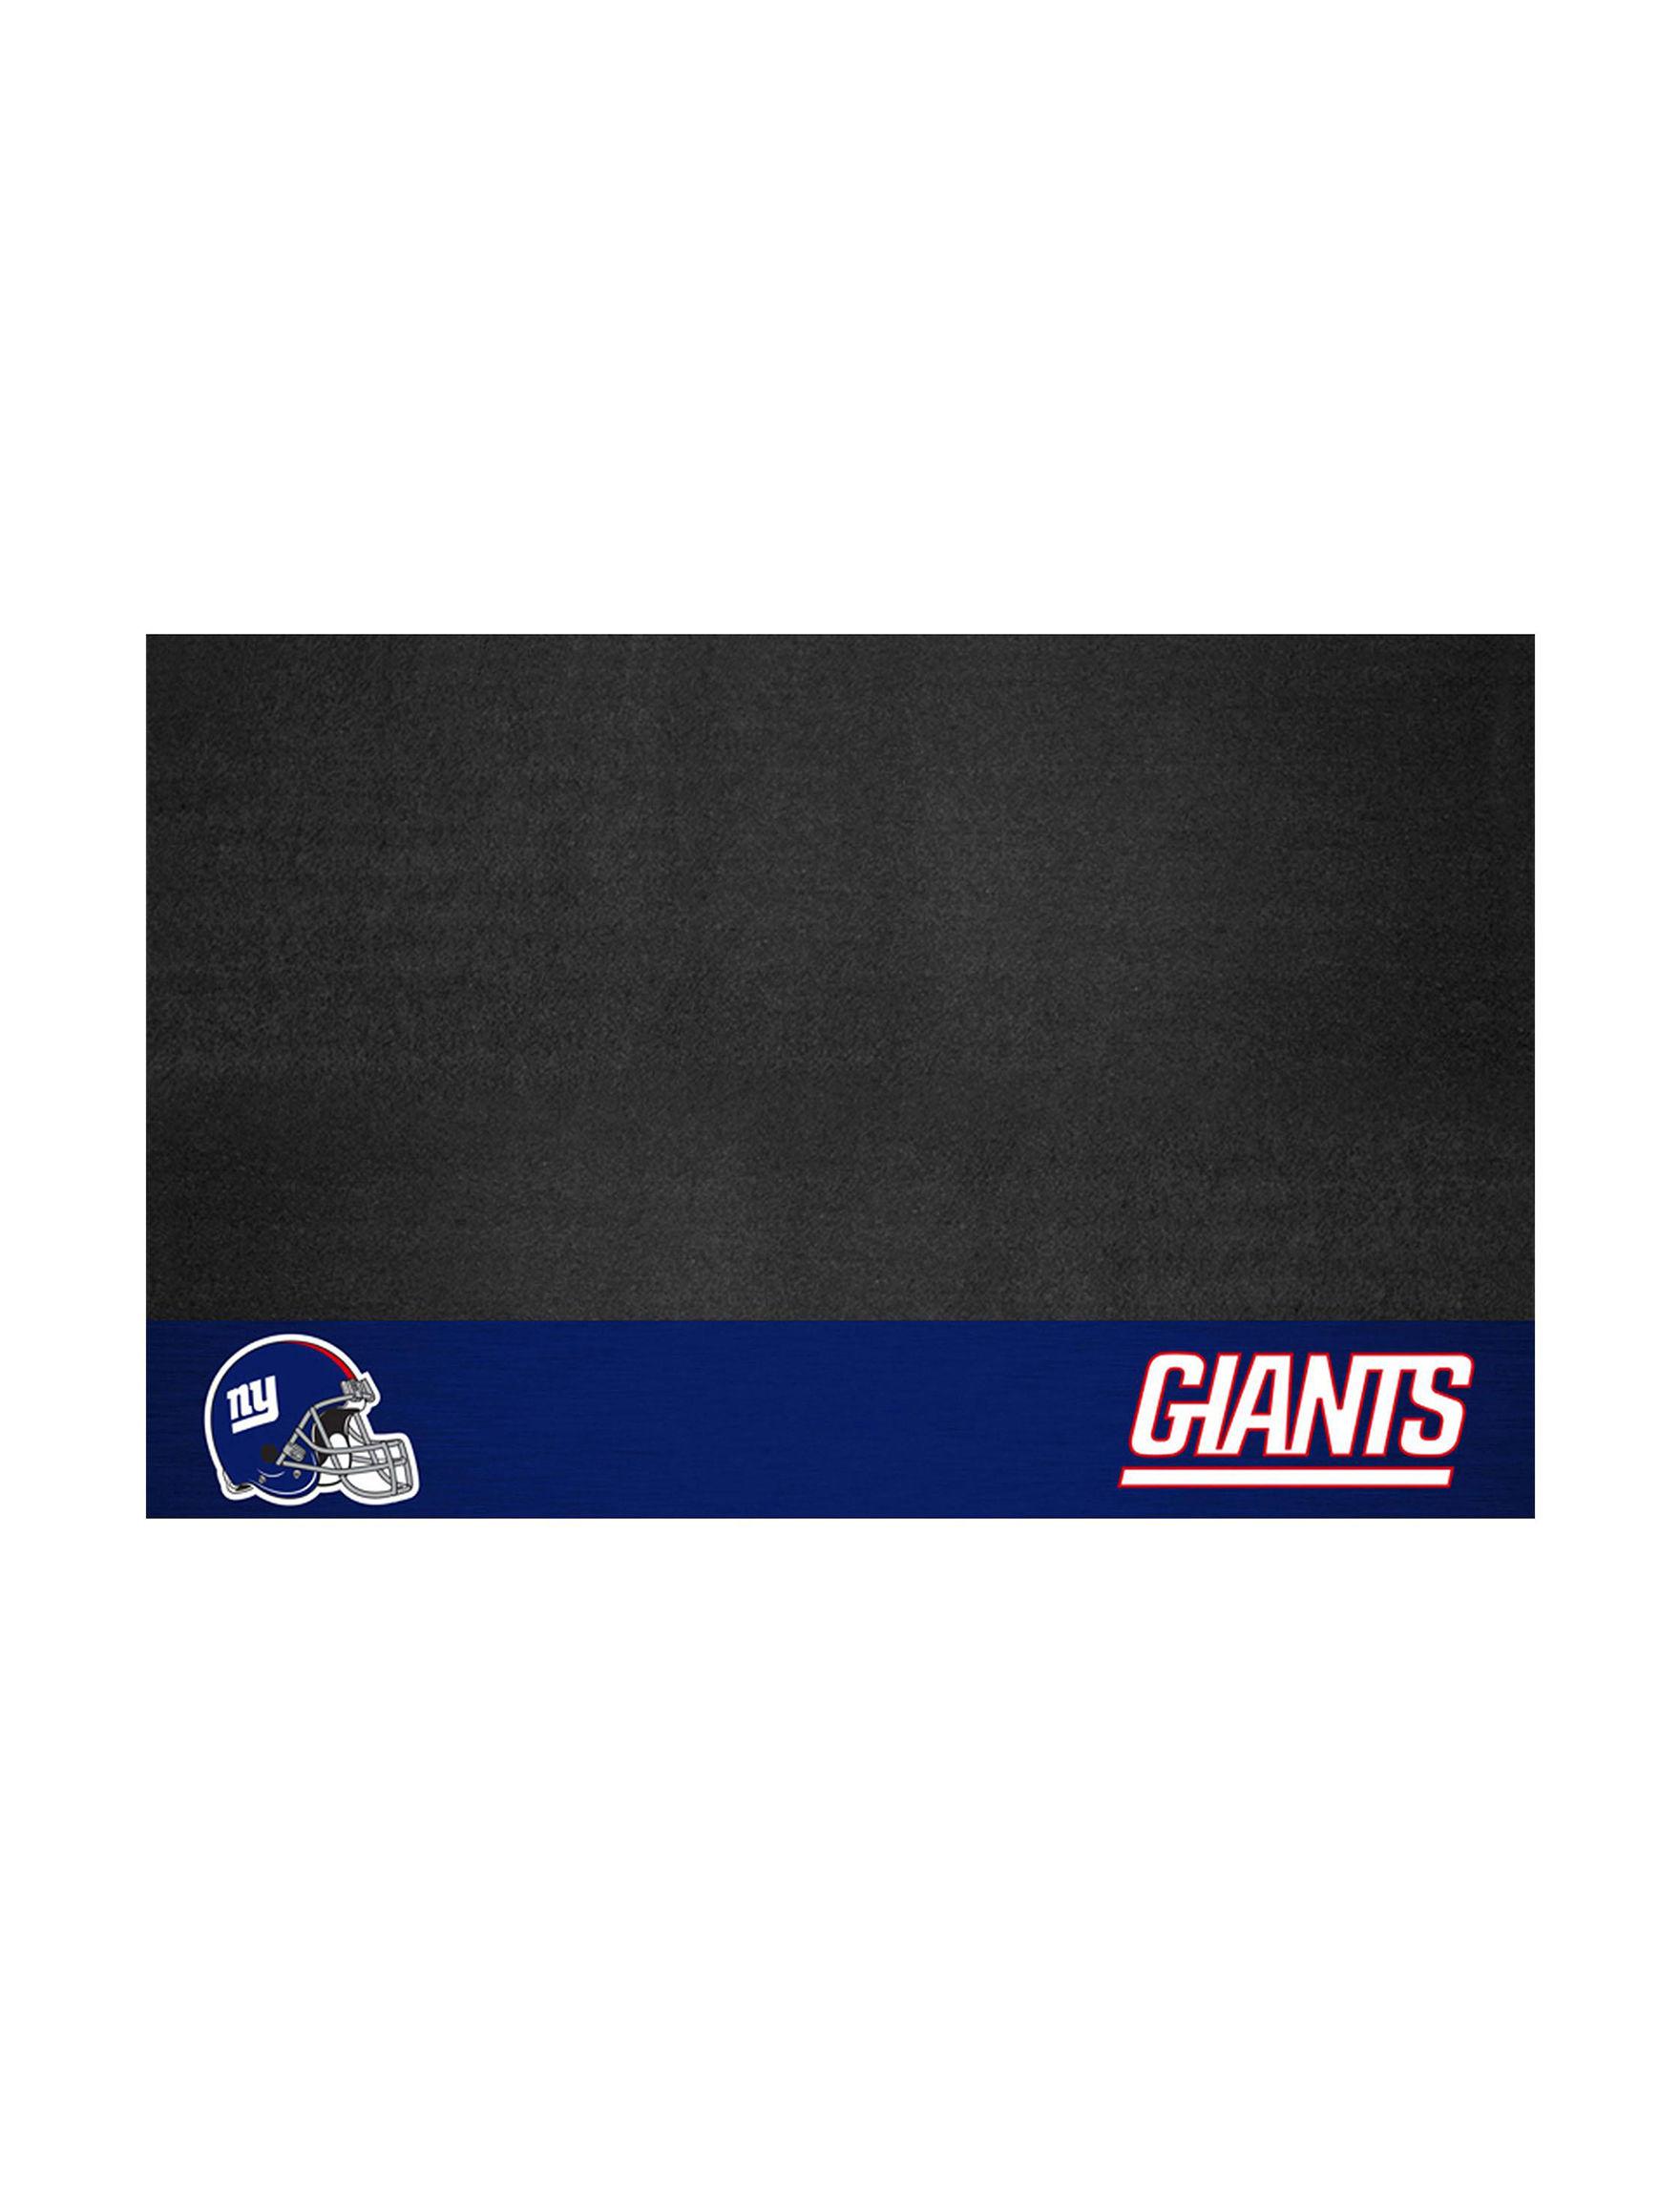 Fanmats Black / Blue Outdoor Rugs & Doormats Outdoor Decor